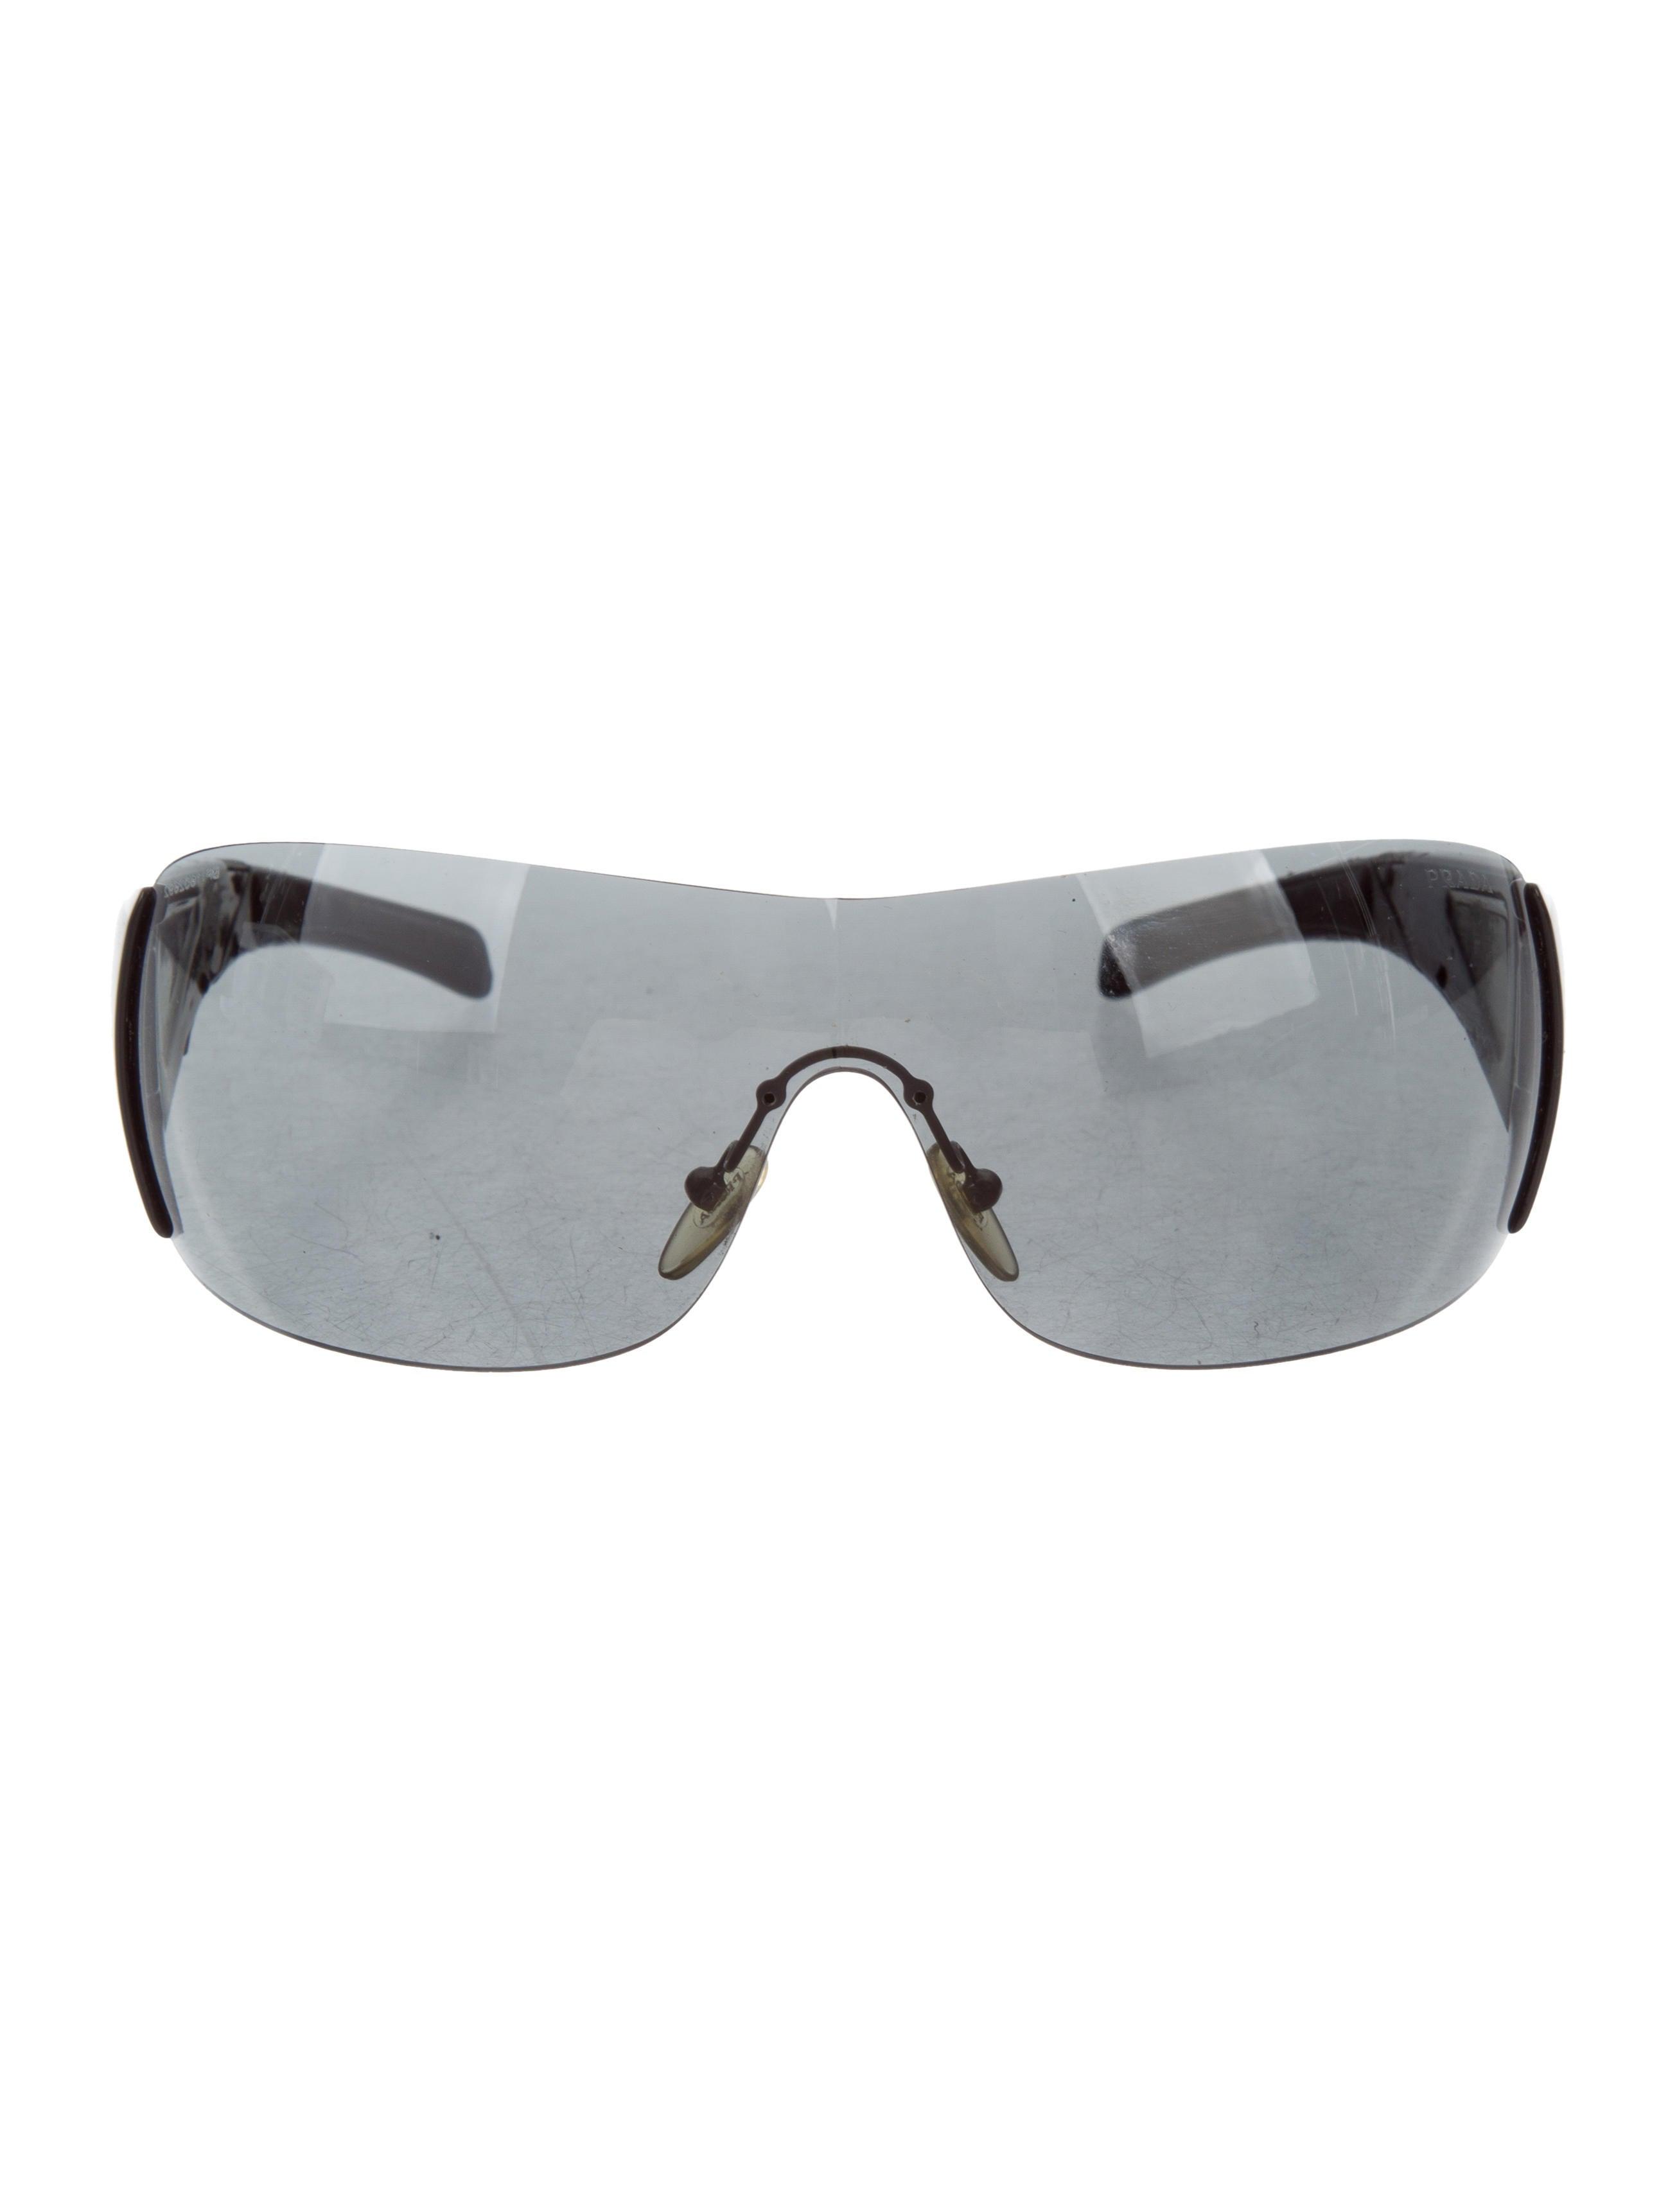 95531edb7ca sweden prada rimless shield sunglasses a5a59 aeff7